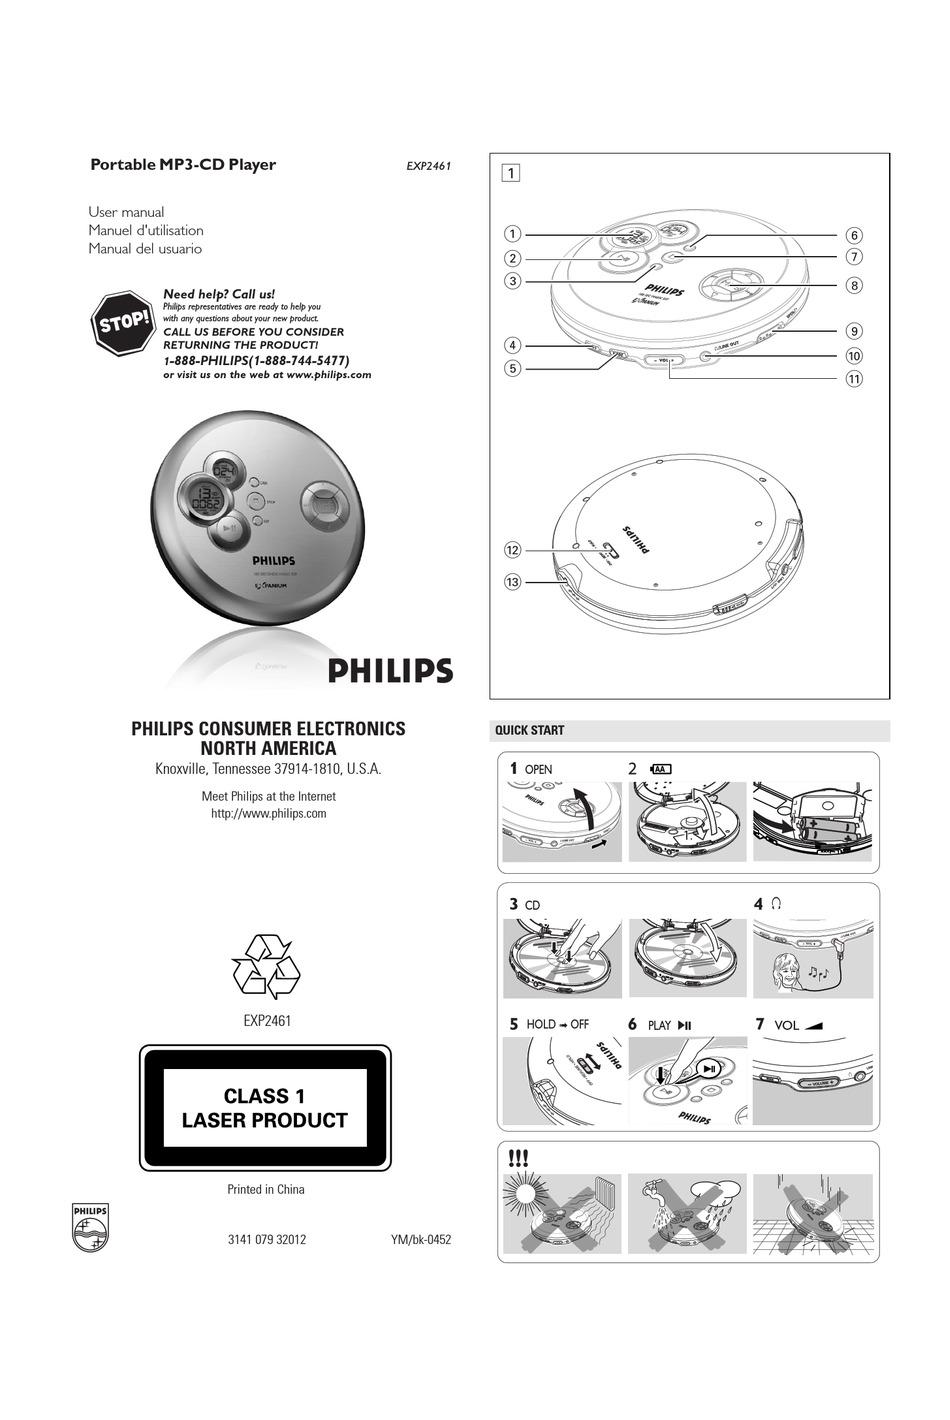 PHILIPS EXPANIUM EXP-2461 USER MANUAL Pdf Download